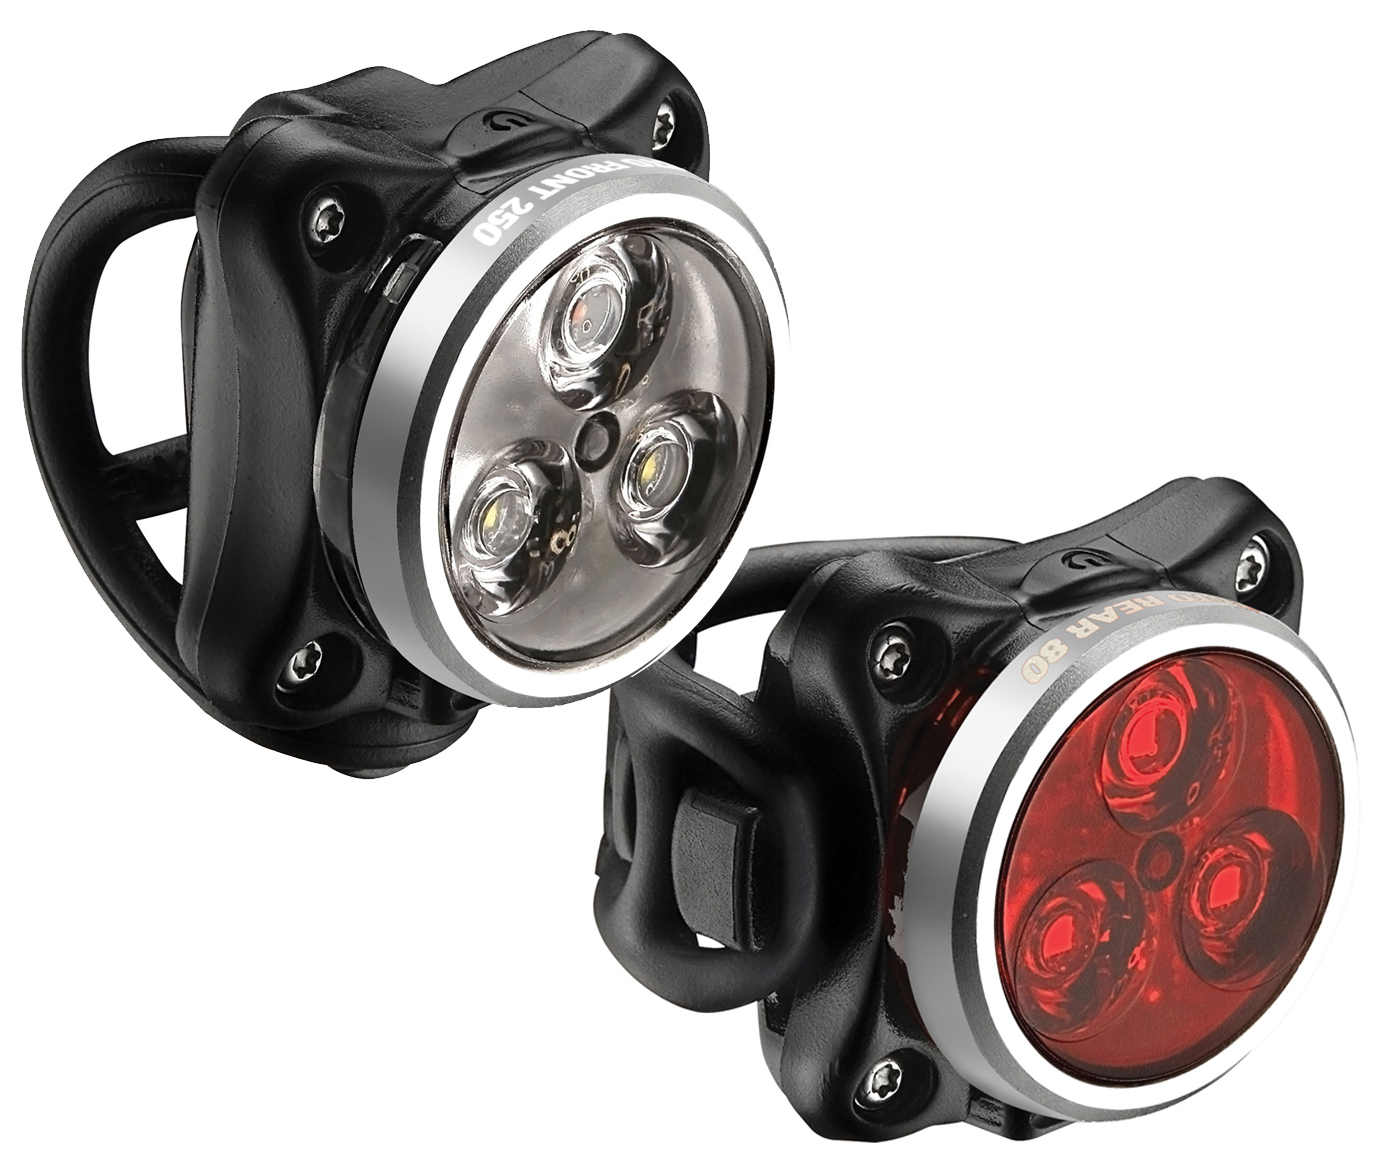 Lezyne Zecto Drive bike light set